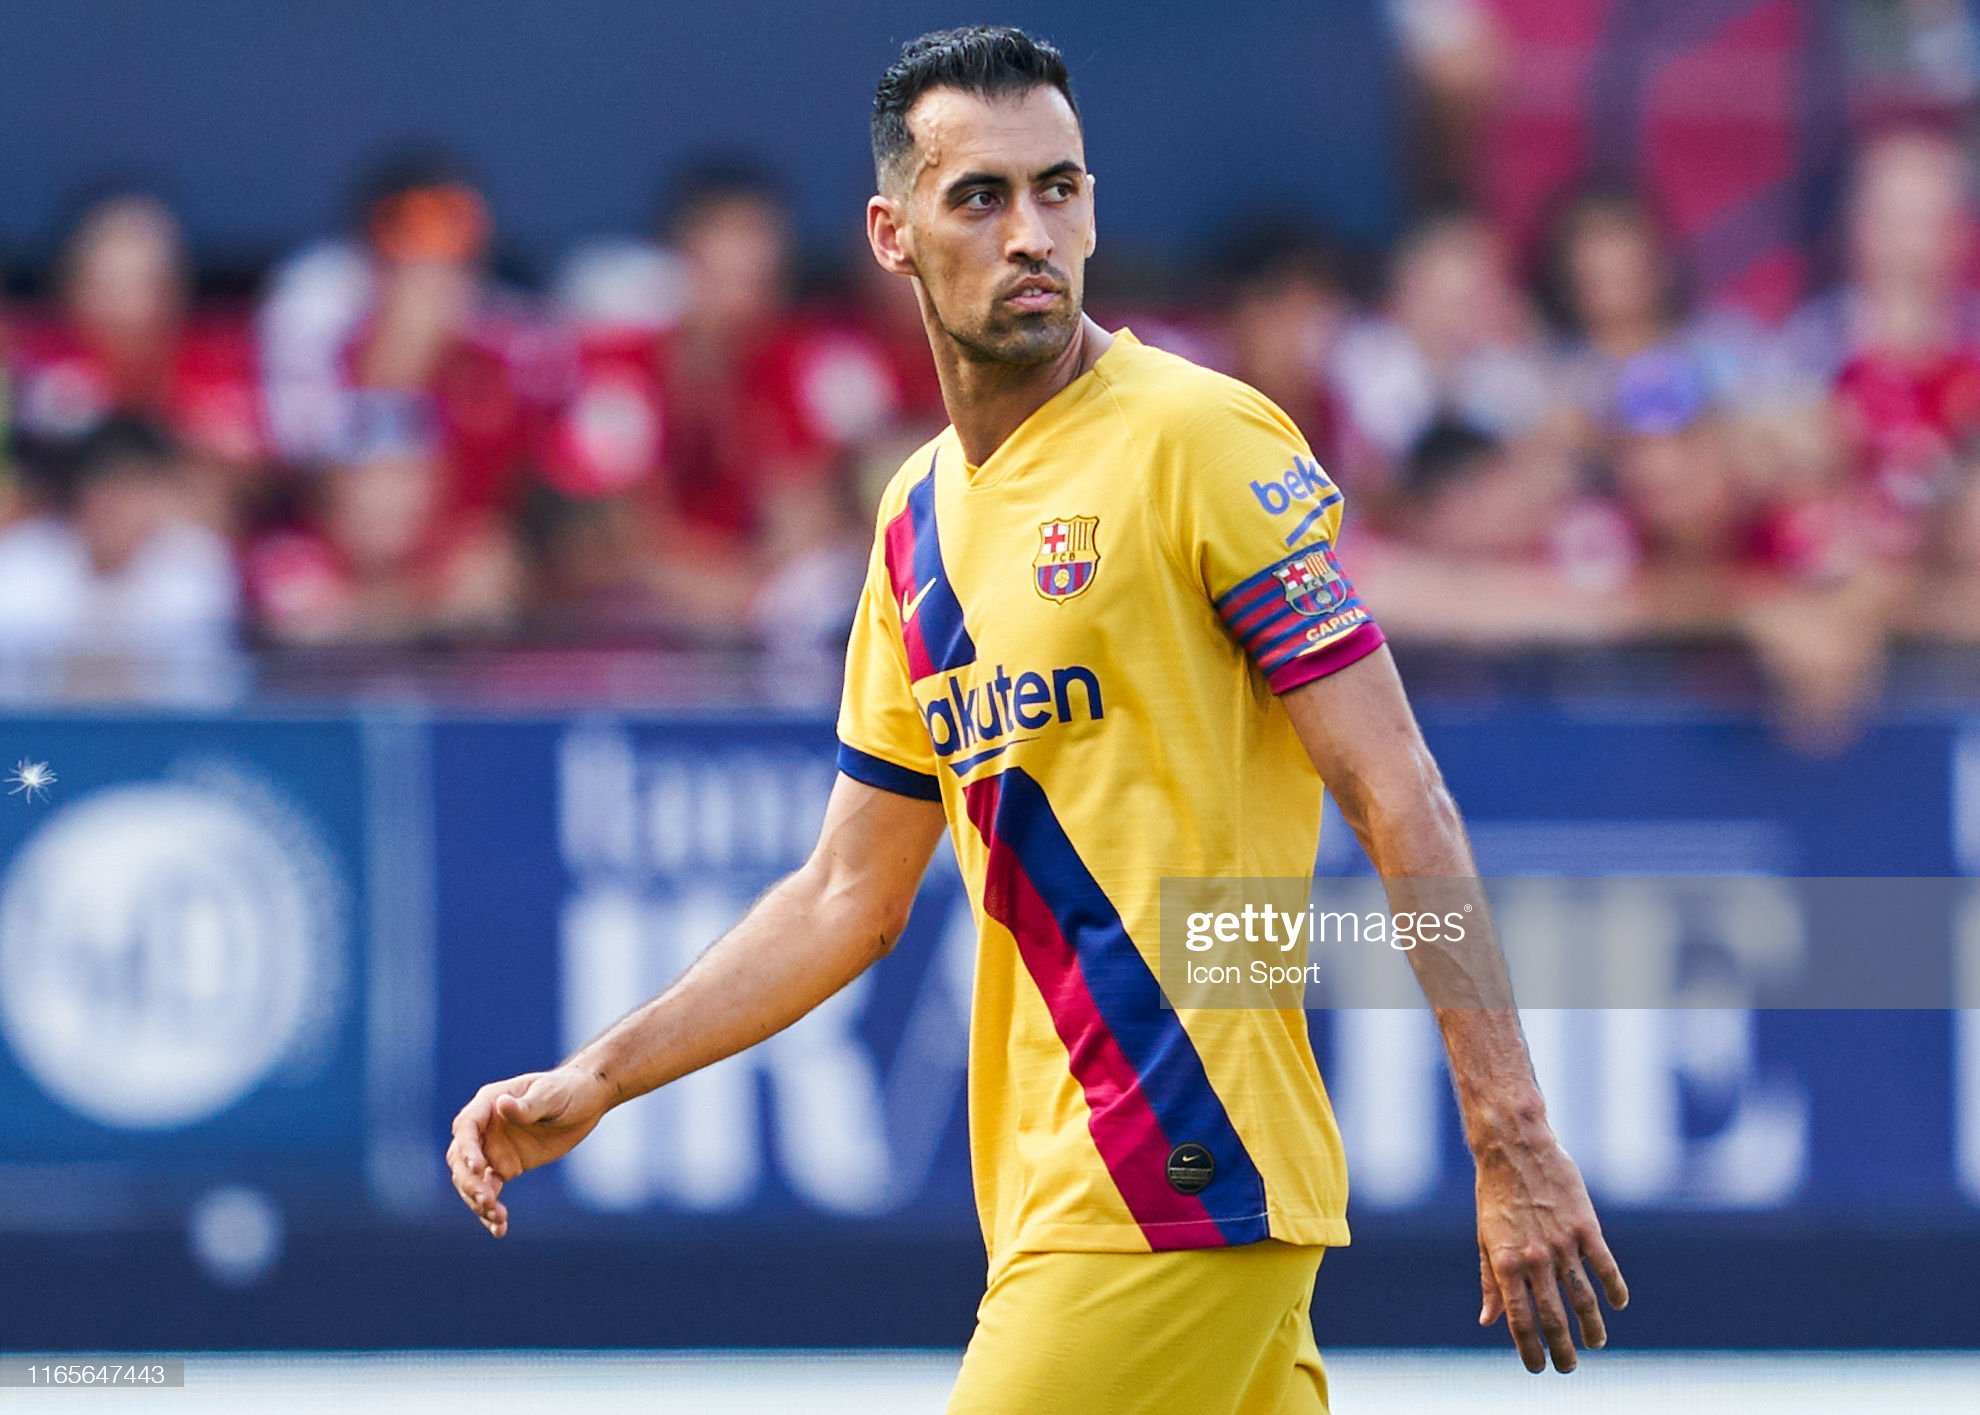 صور مباراة : أوساسونا - برشلونة 2-2 ( 31-08-2019 )  Sergio-busquets-of-fc-barcelona-during-the-liga-match-between-osasuna-picture-id1165647443?s=2048x2048